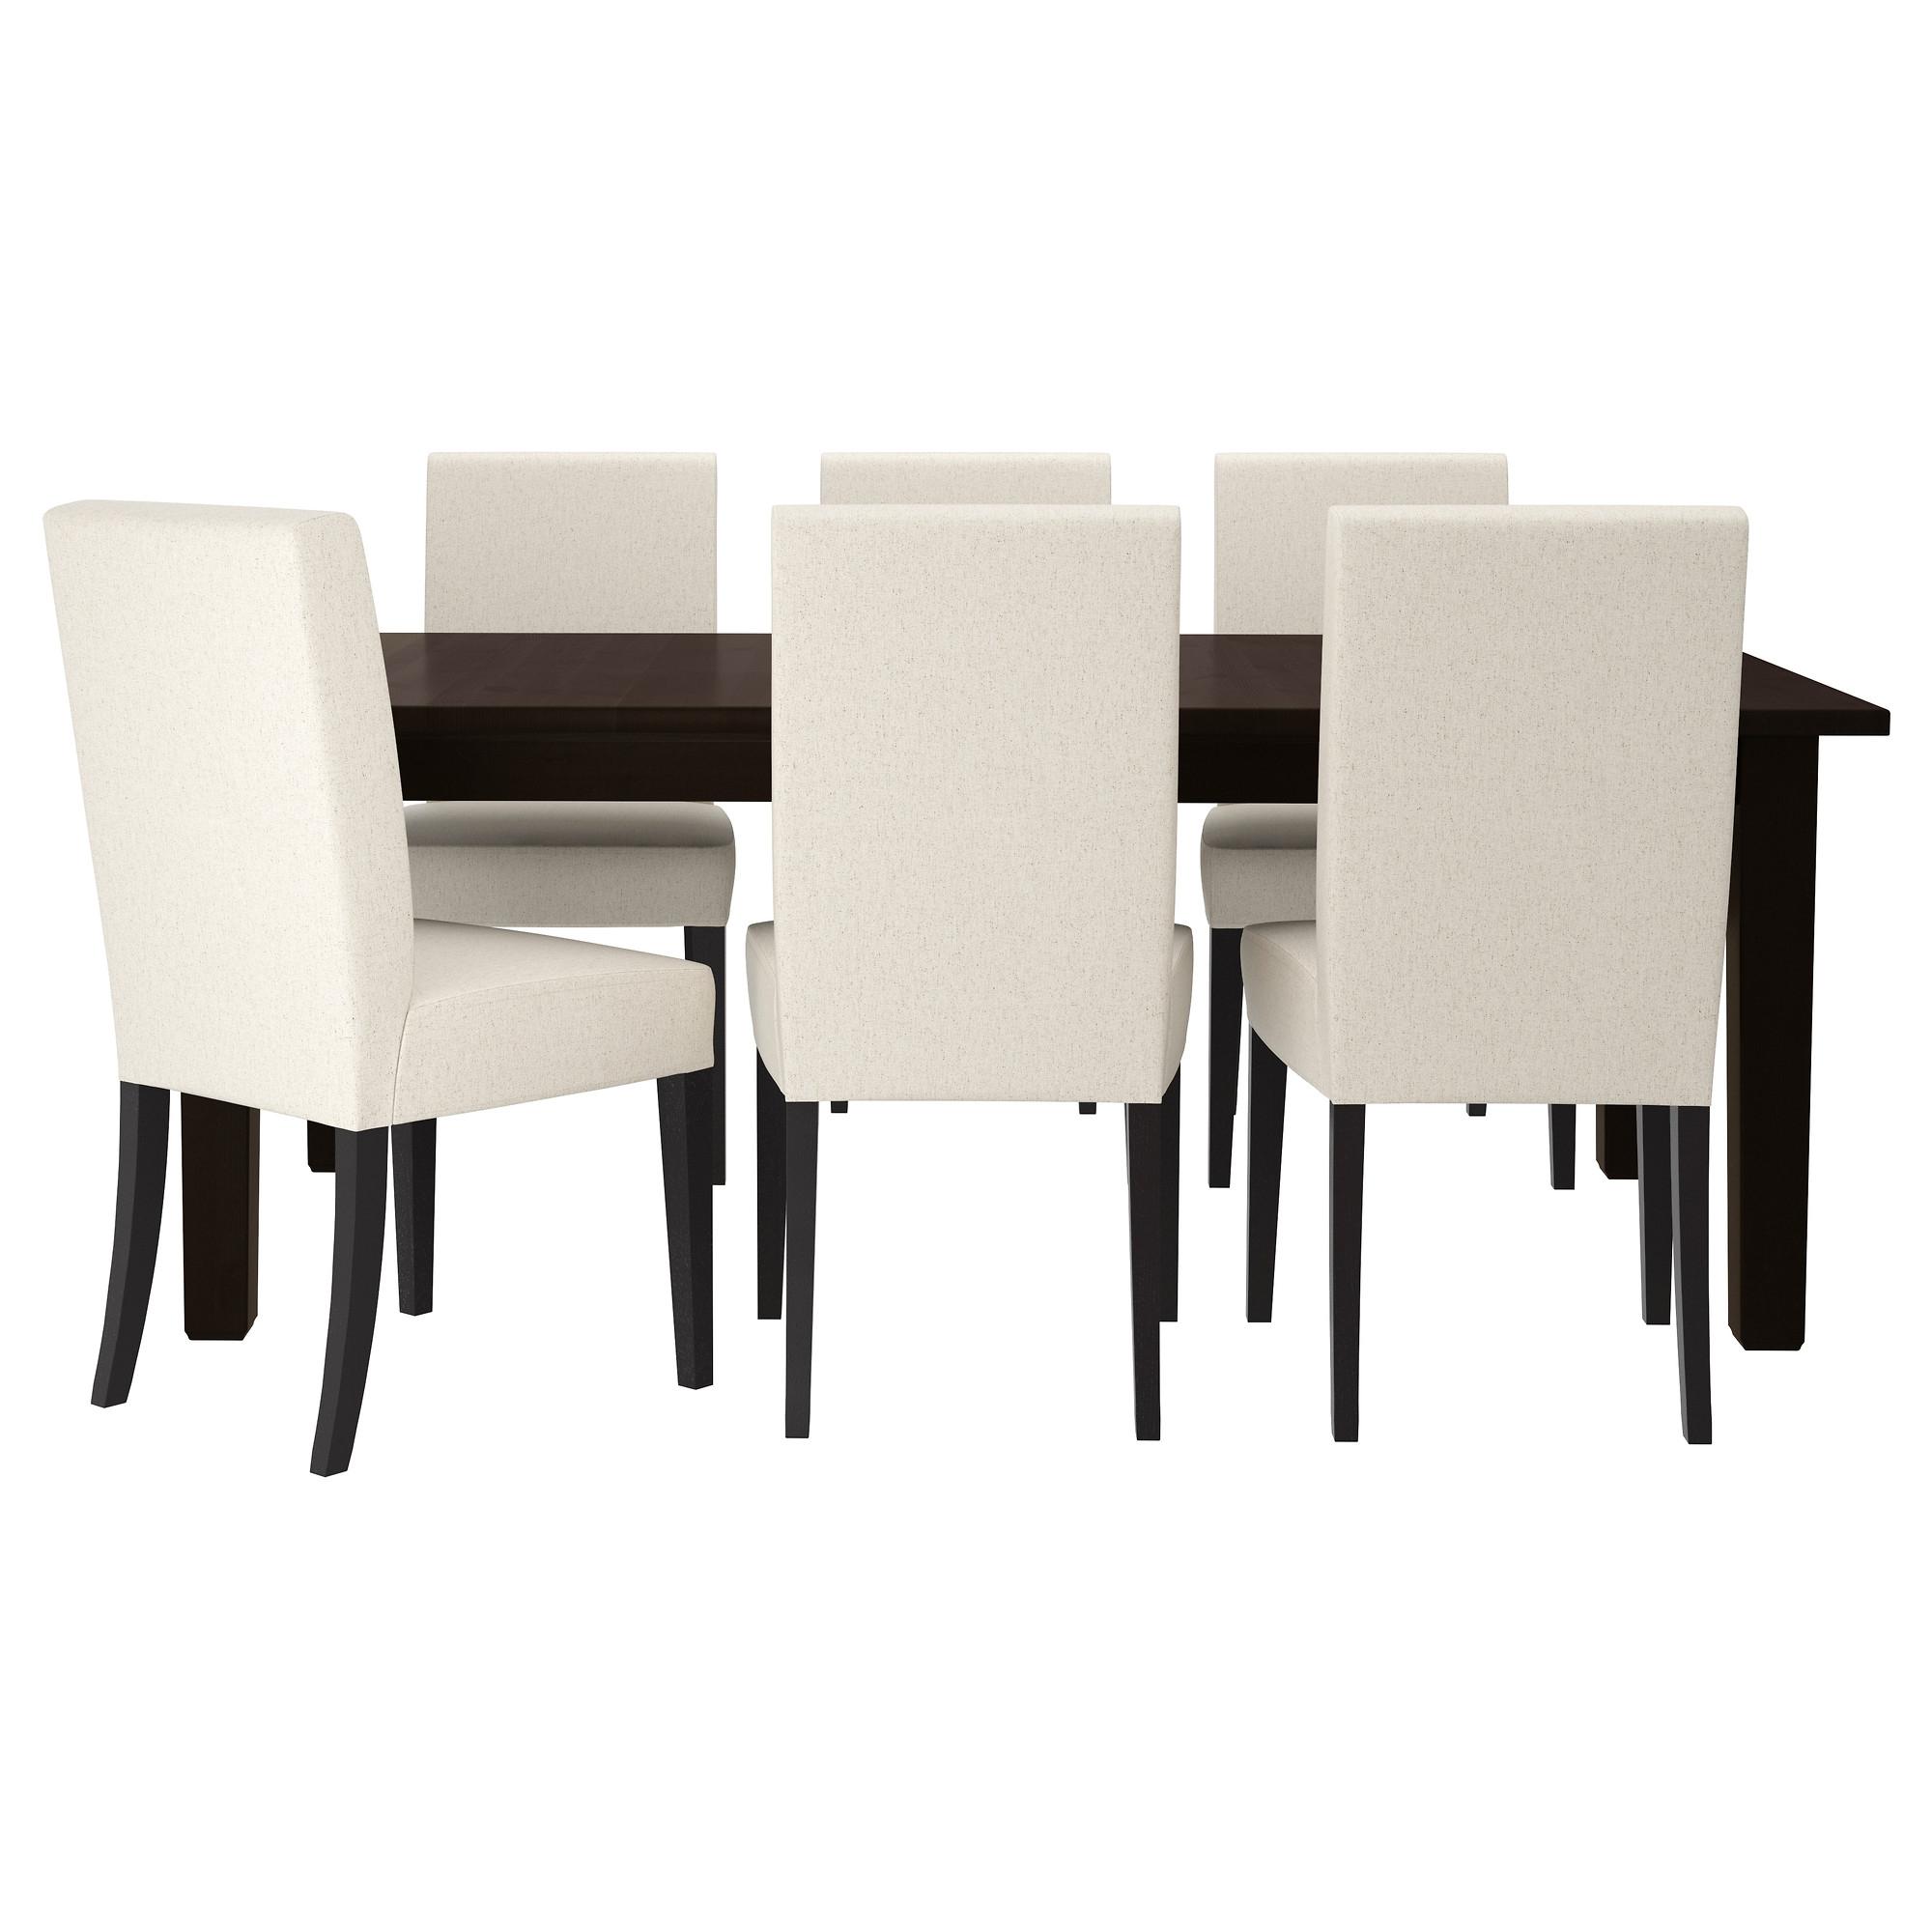 Storn s mesa con 6 sillas for Sillas de comedor ikea